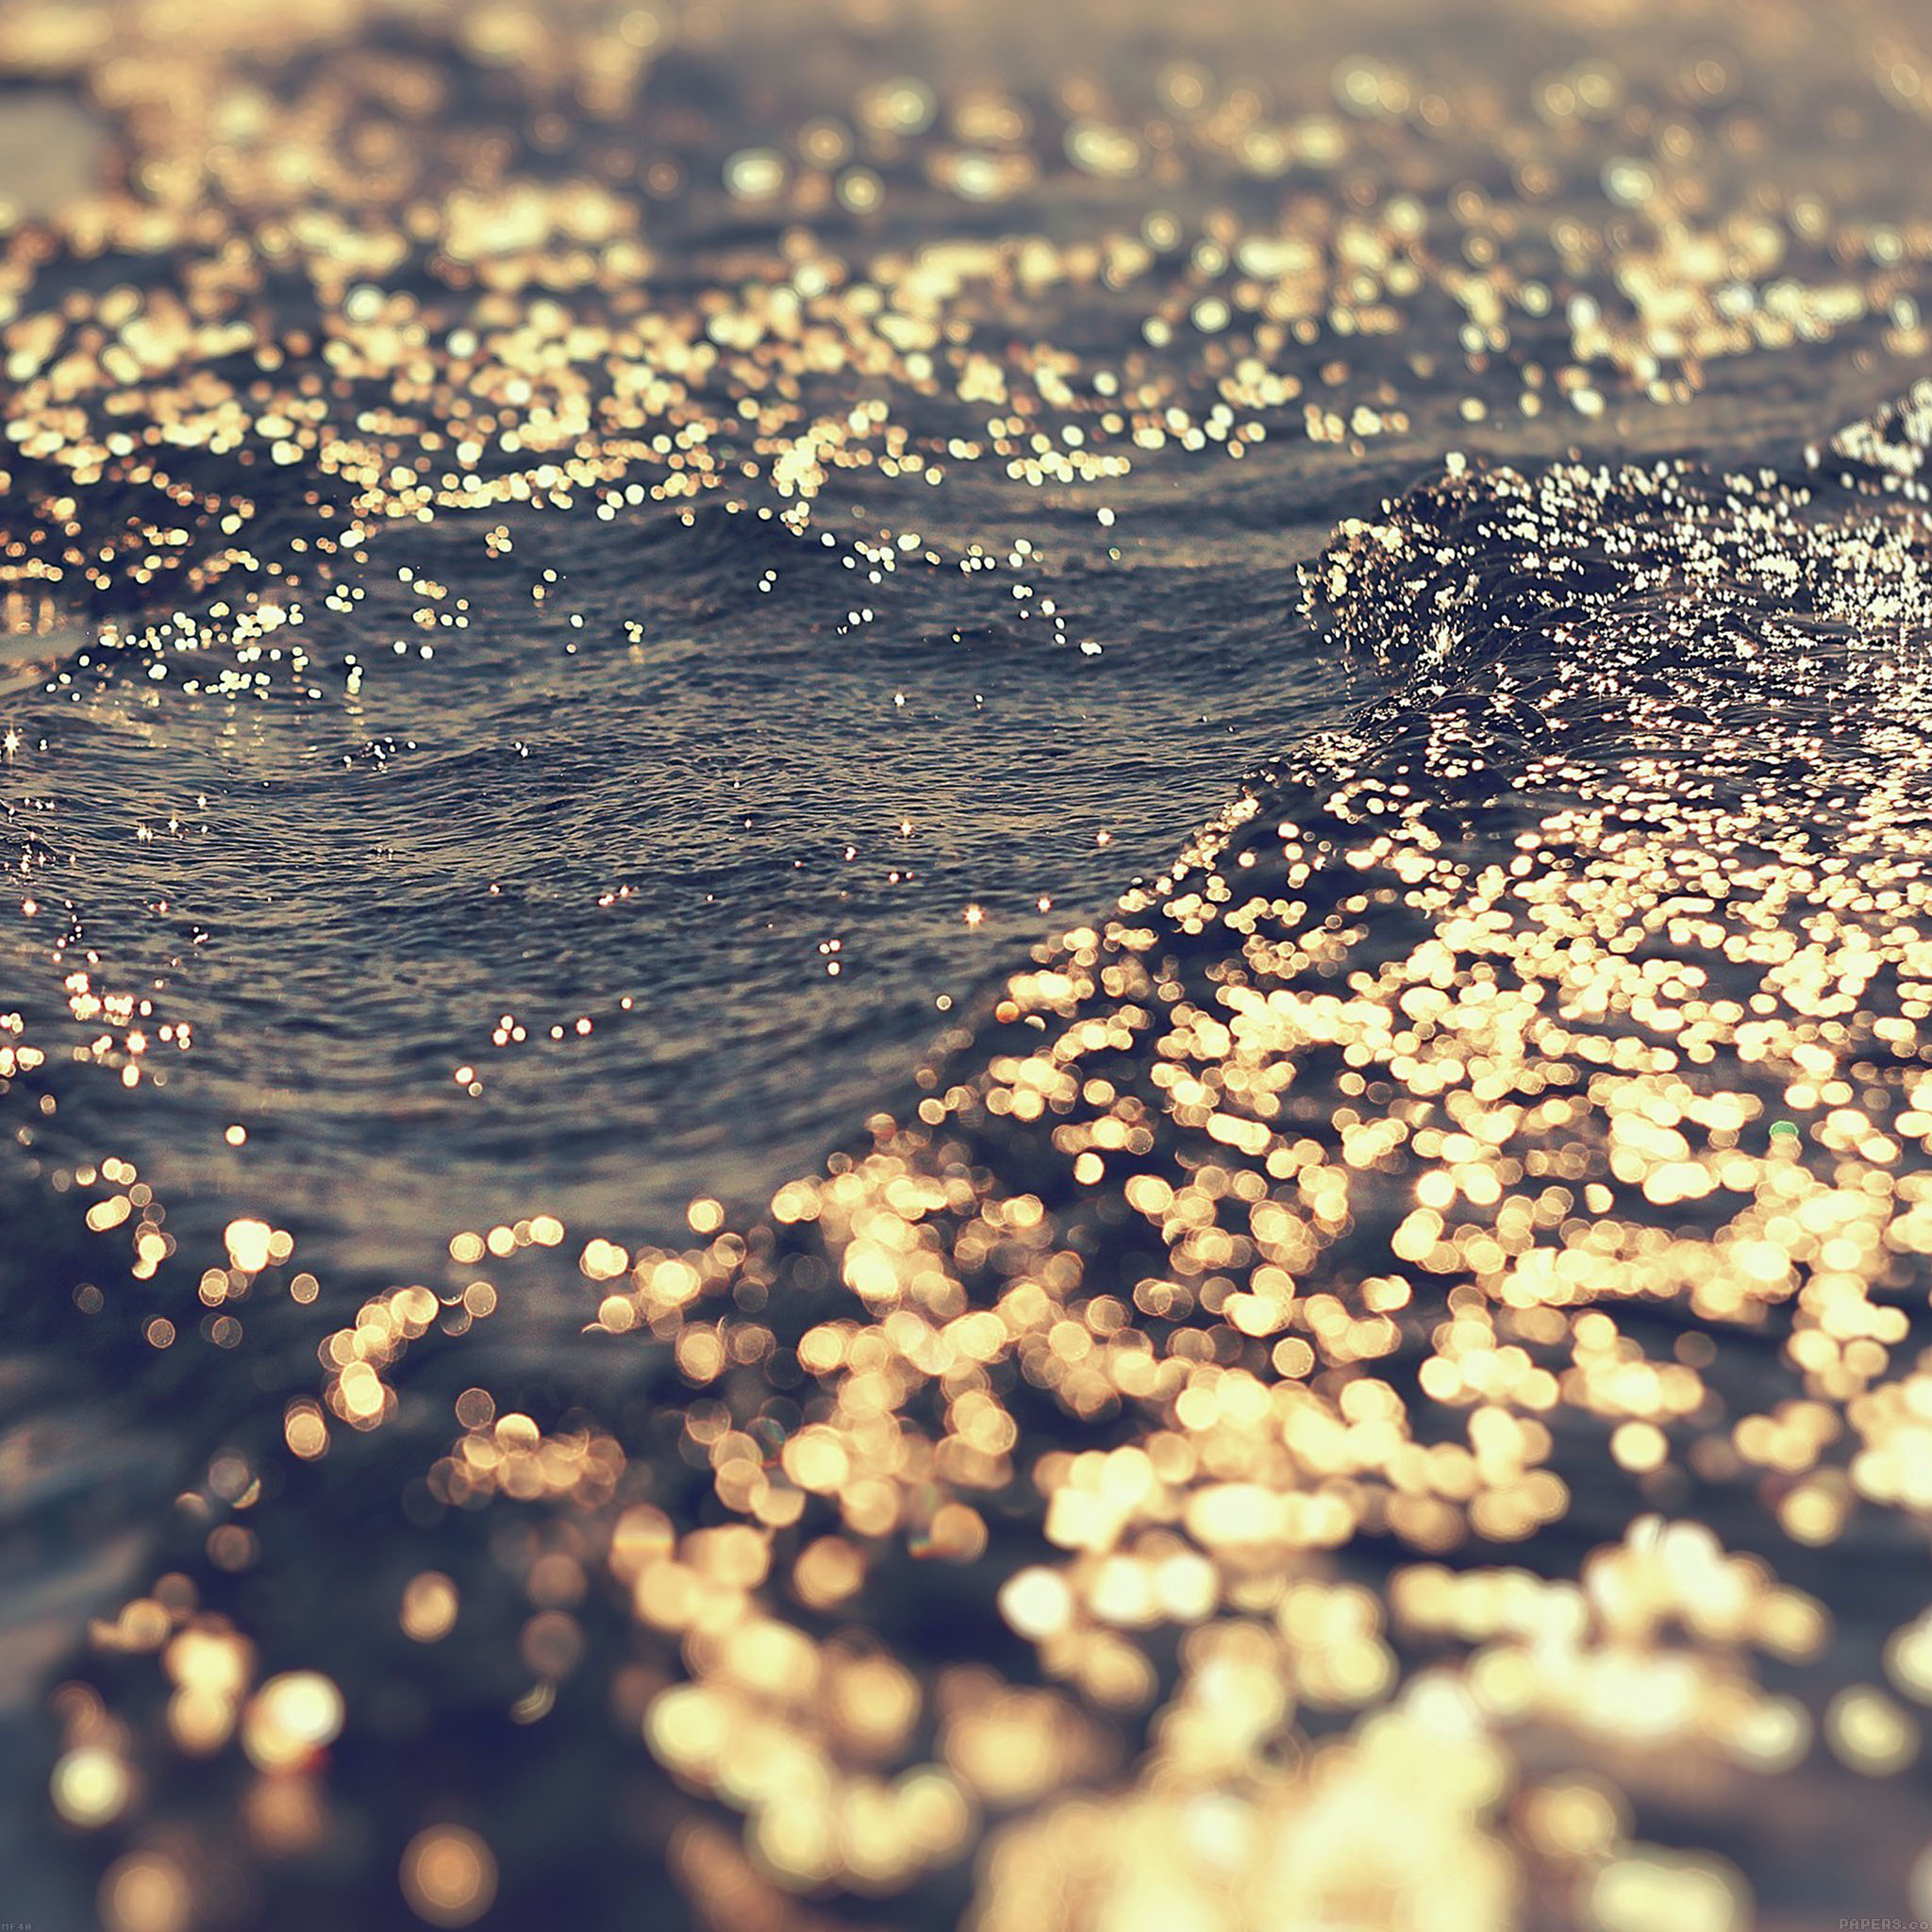 Mf40 gold sea water sunset ocean - Aquatic wallpaper ...